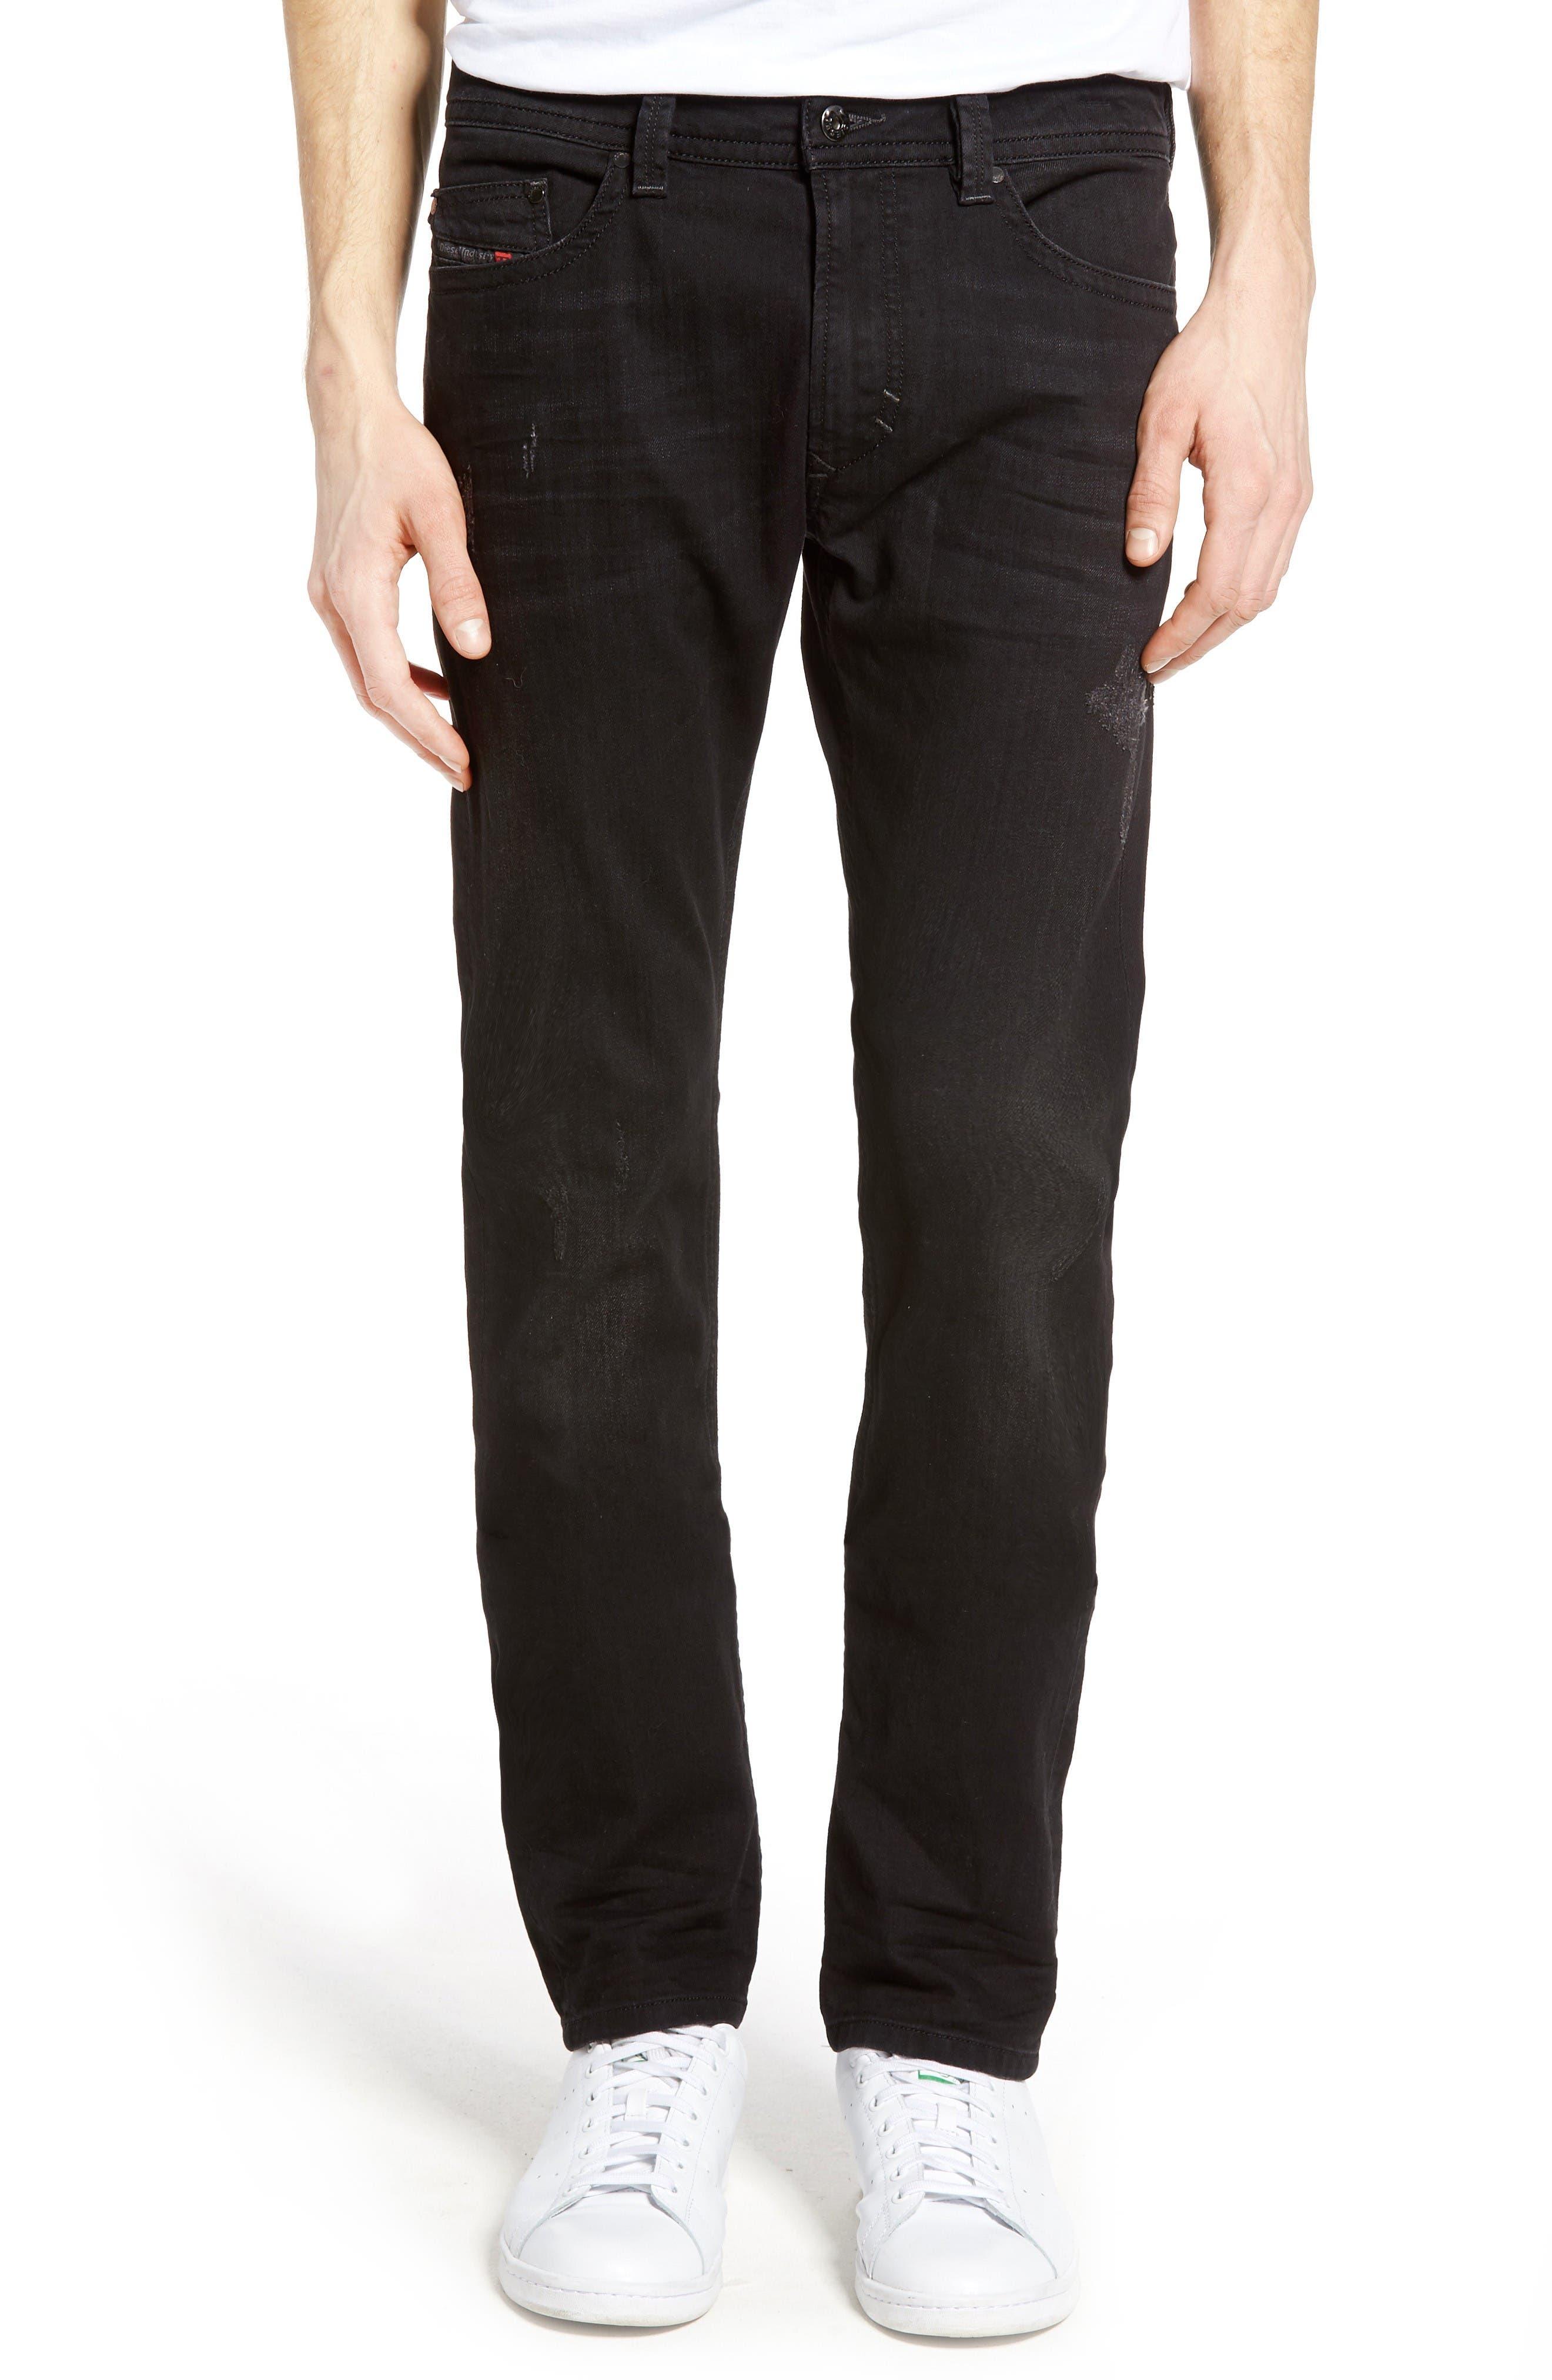 Thavar Skinny Fit Jeans,                             Main thumbnail 1, color,                             0679F